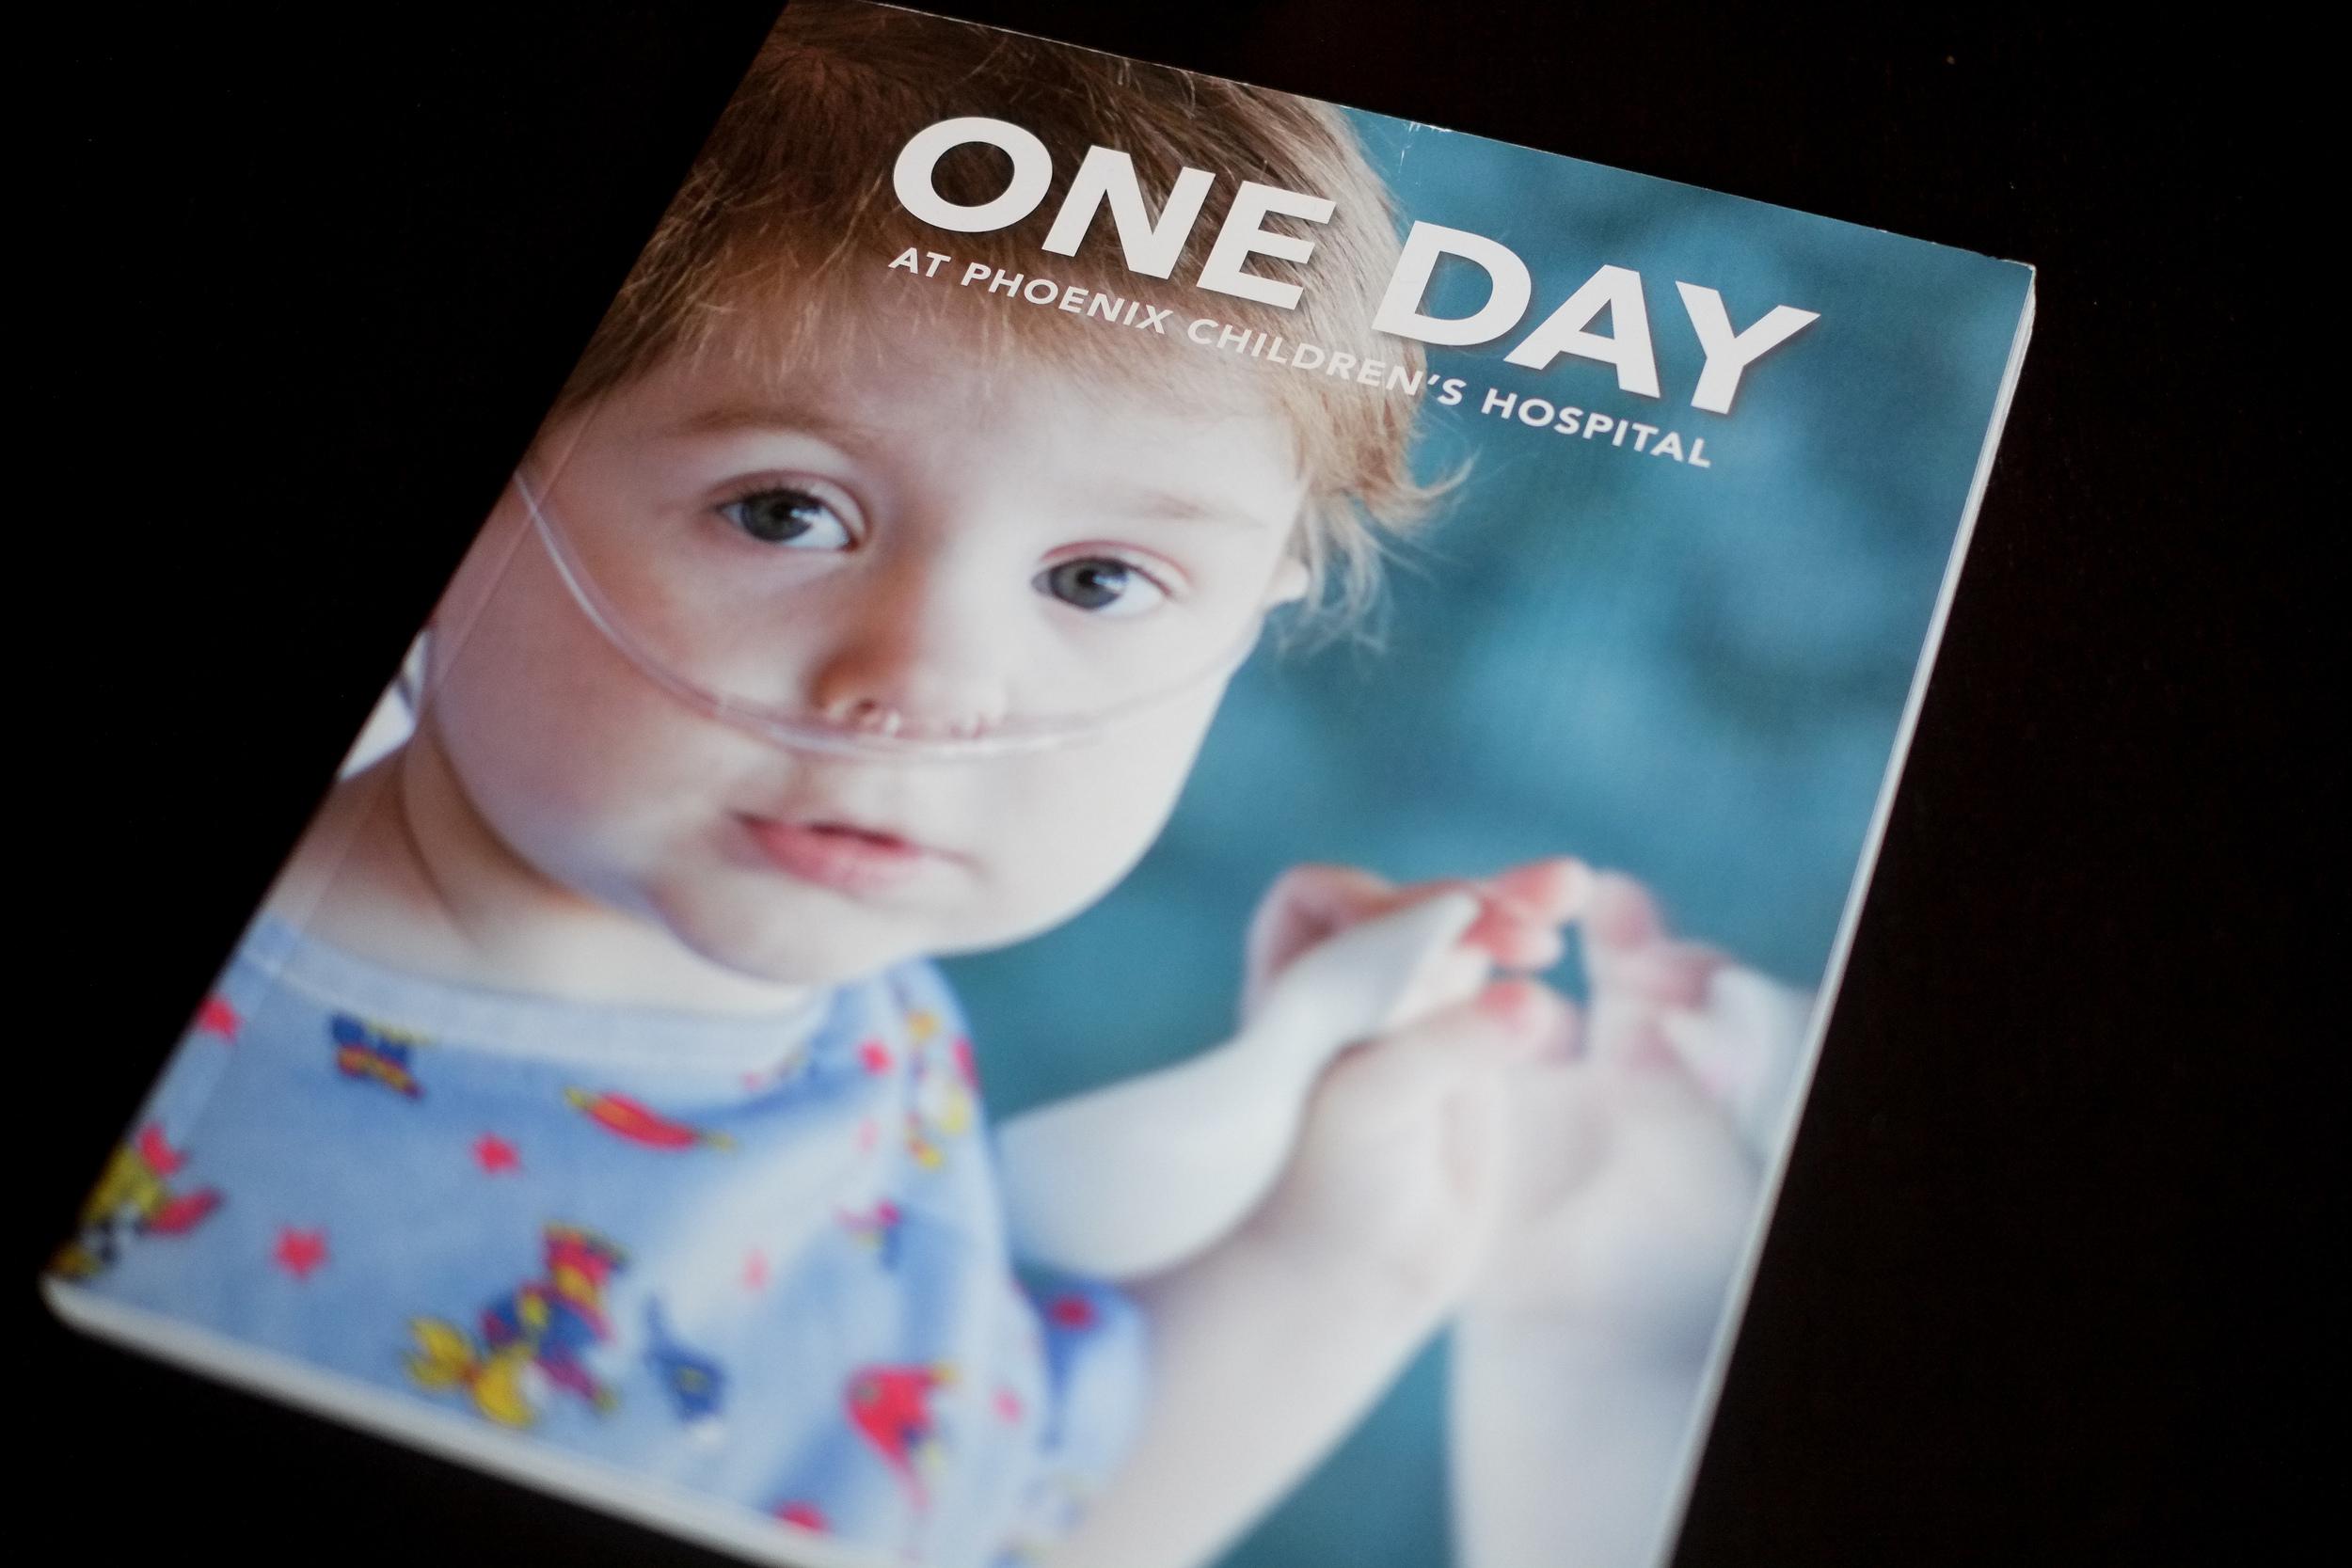 childrens-hospital-book-005.jpg